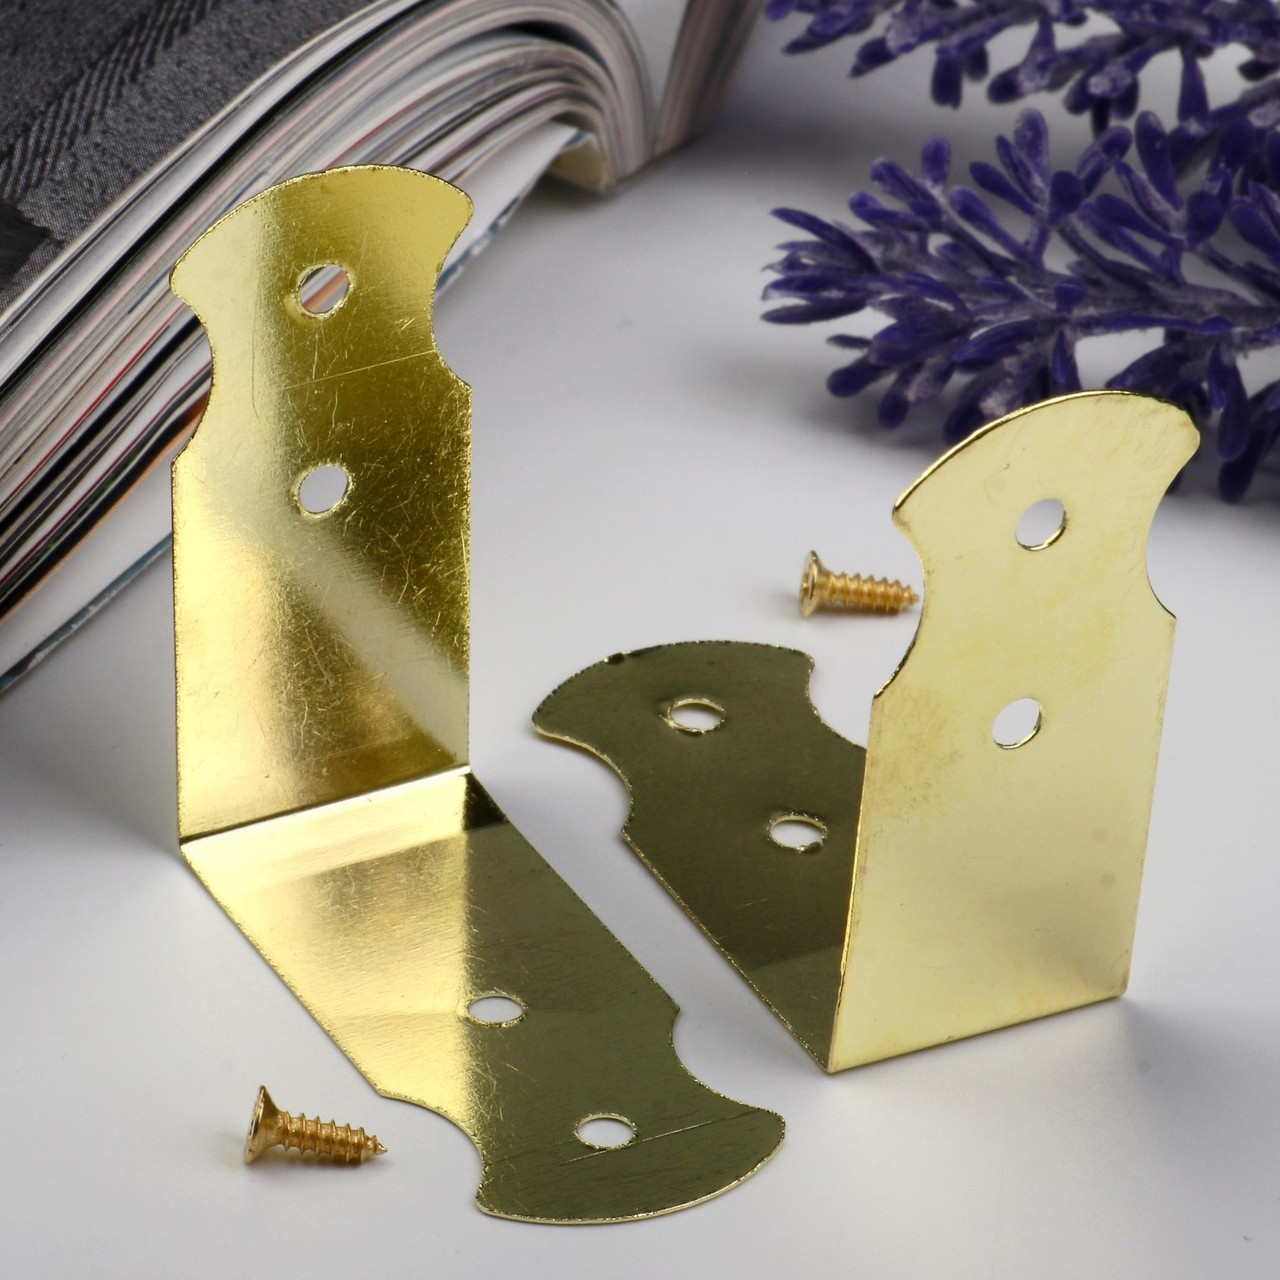 Уголок (накладка) для шкатулок металл + гвозд. золото 4,1х1,8 см (10 штук)